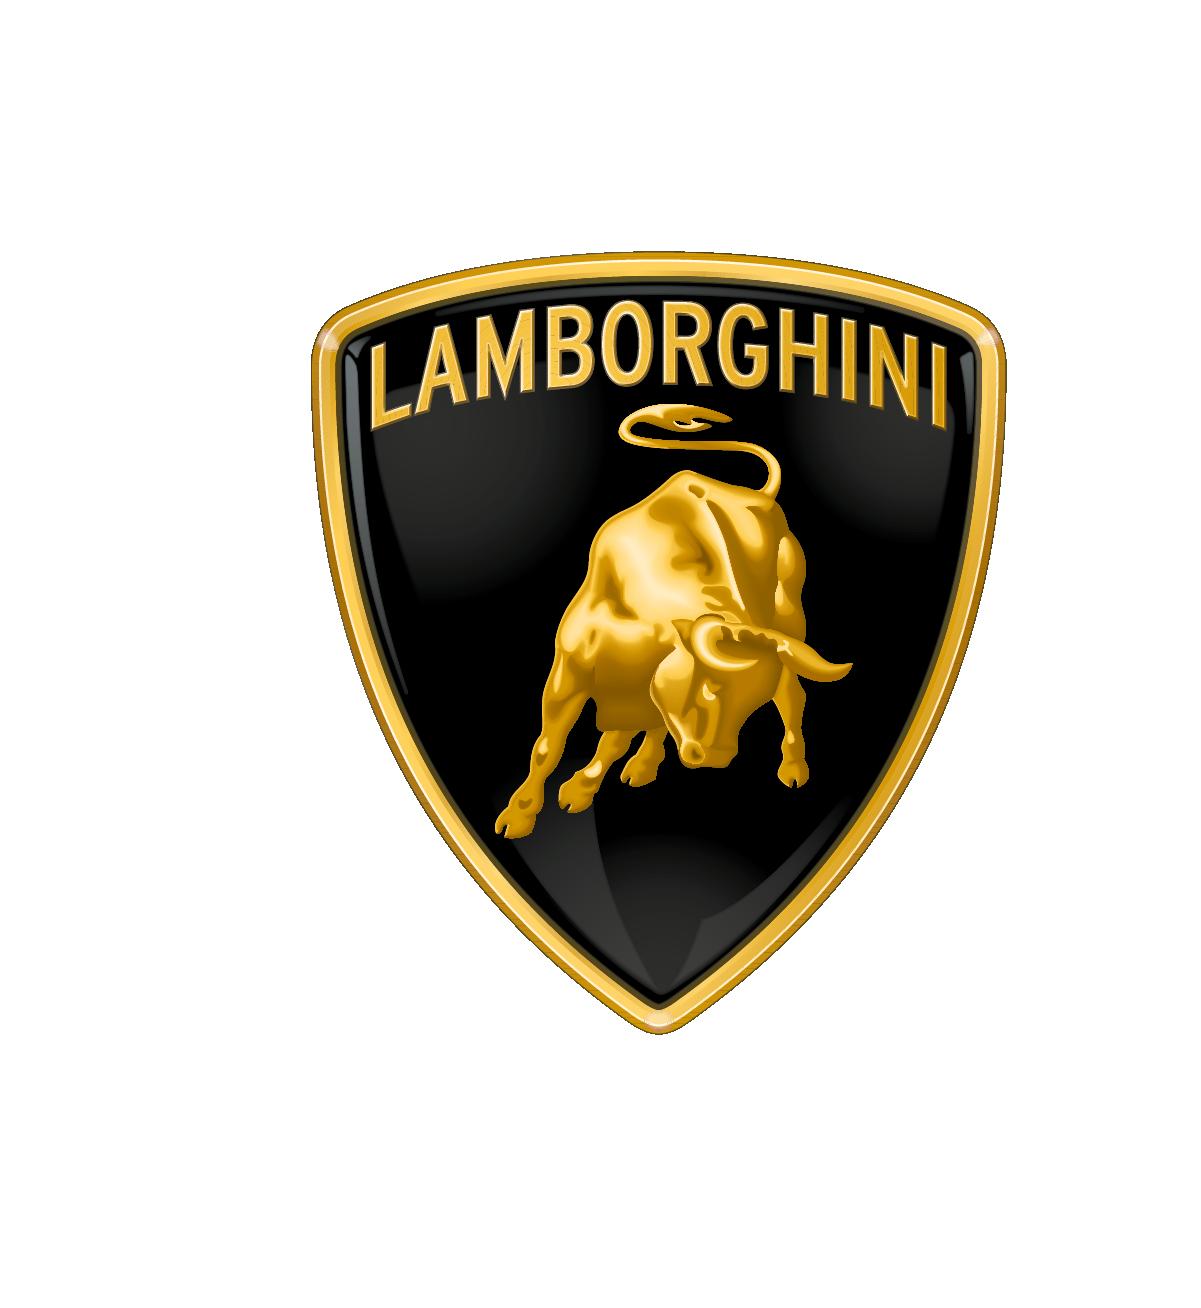 Lamborghini-1200px